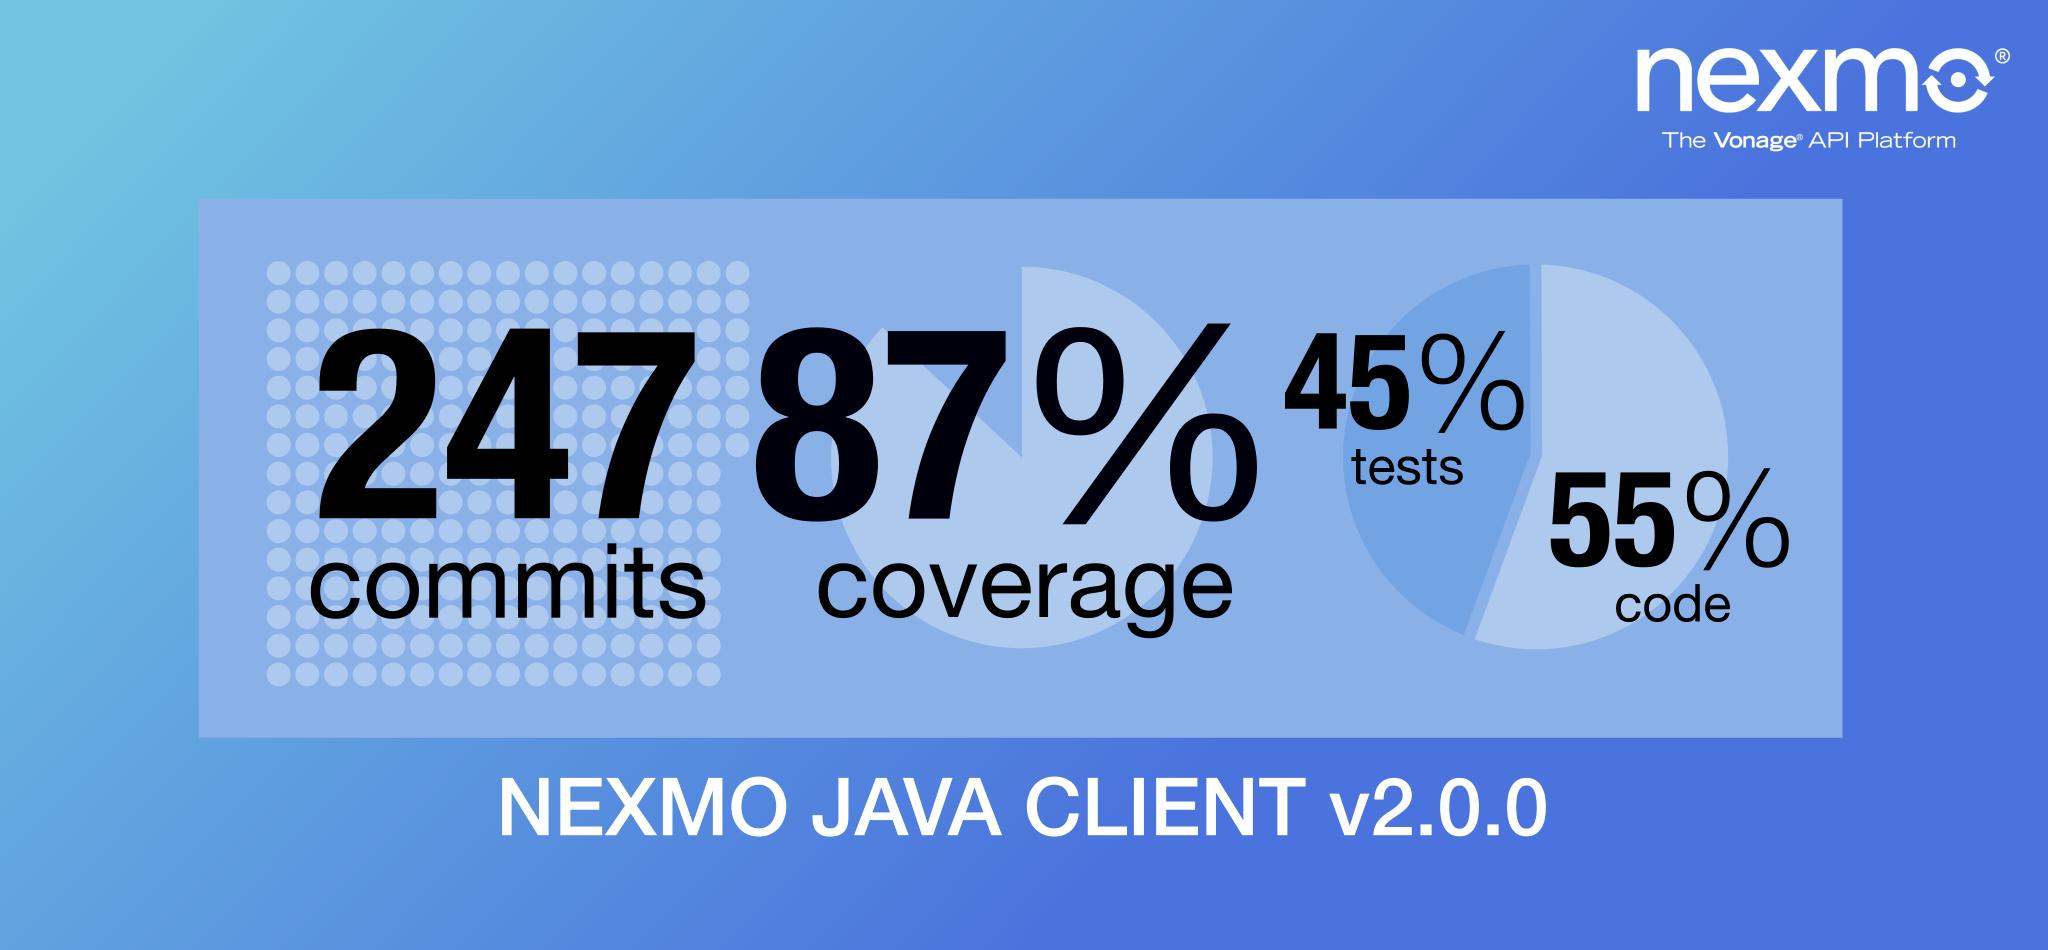 Nexmo Java client v2